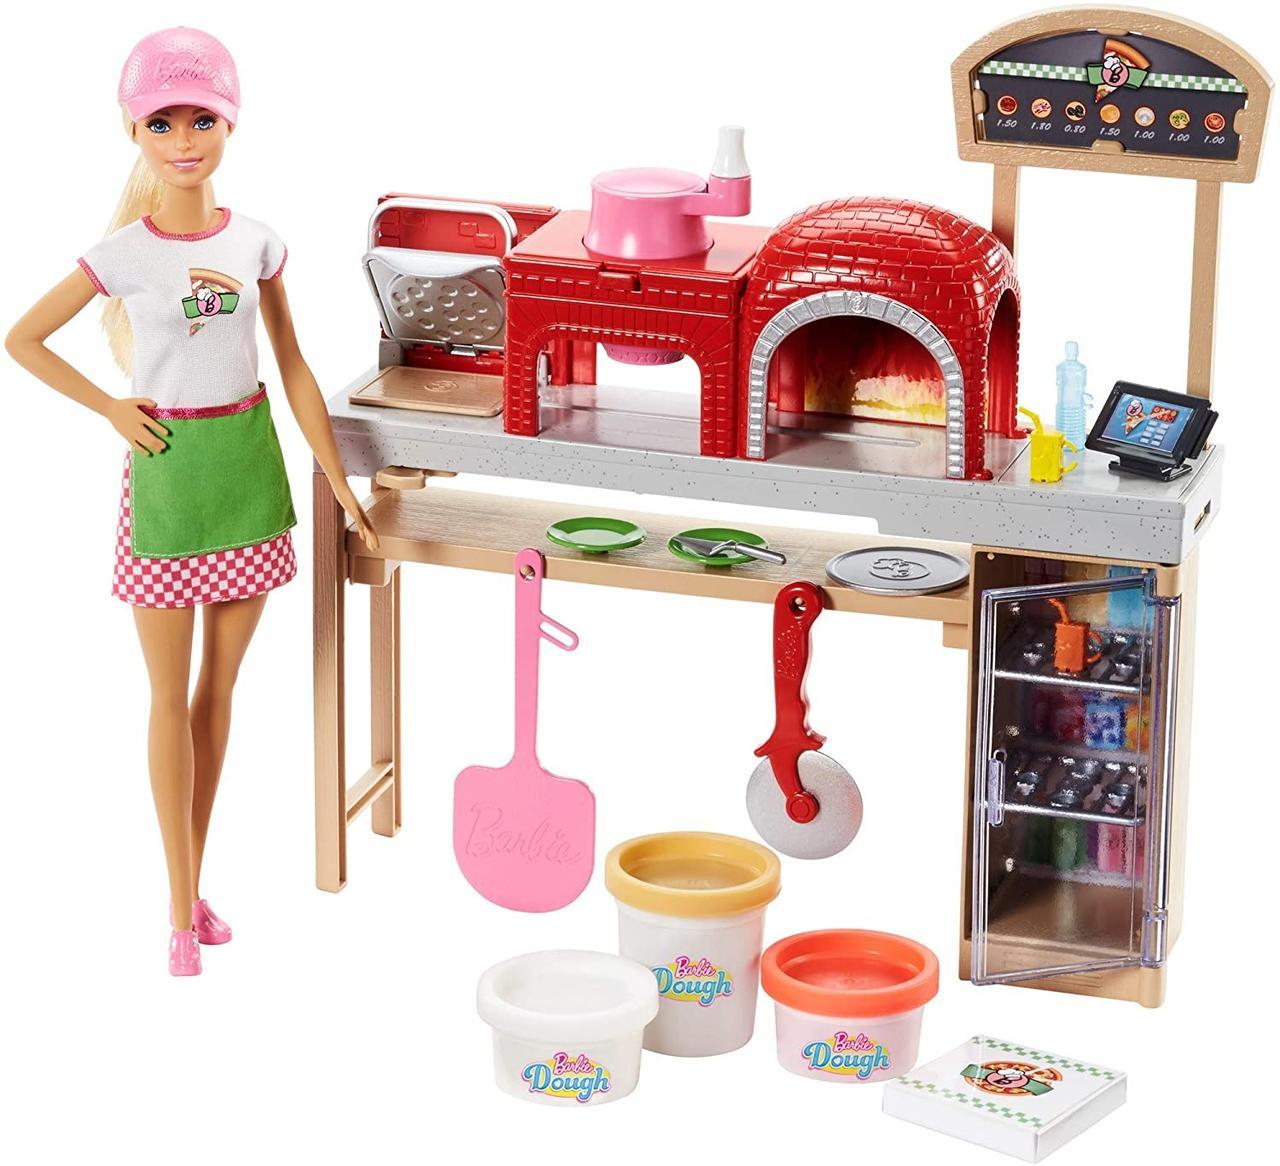 Кукла Барби с кухней и тестом Play Dough Готовим пиццу.